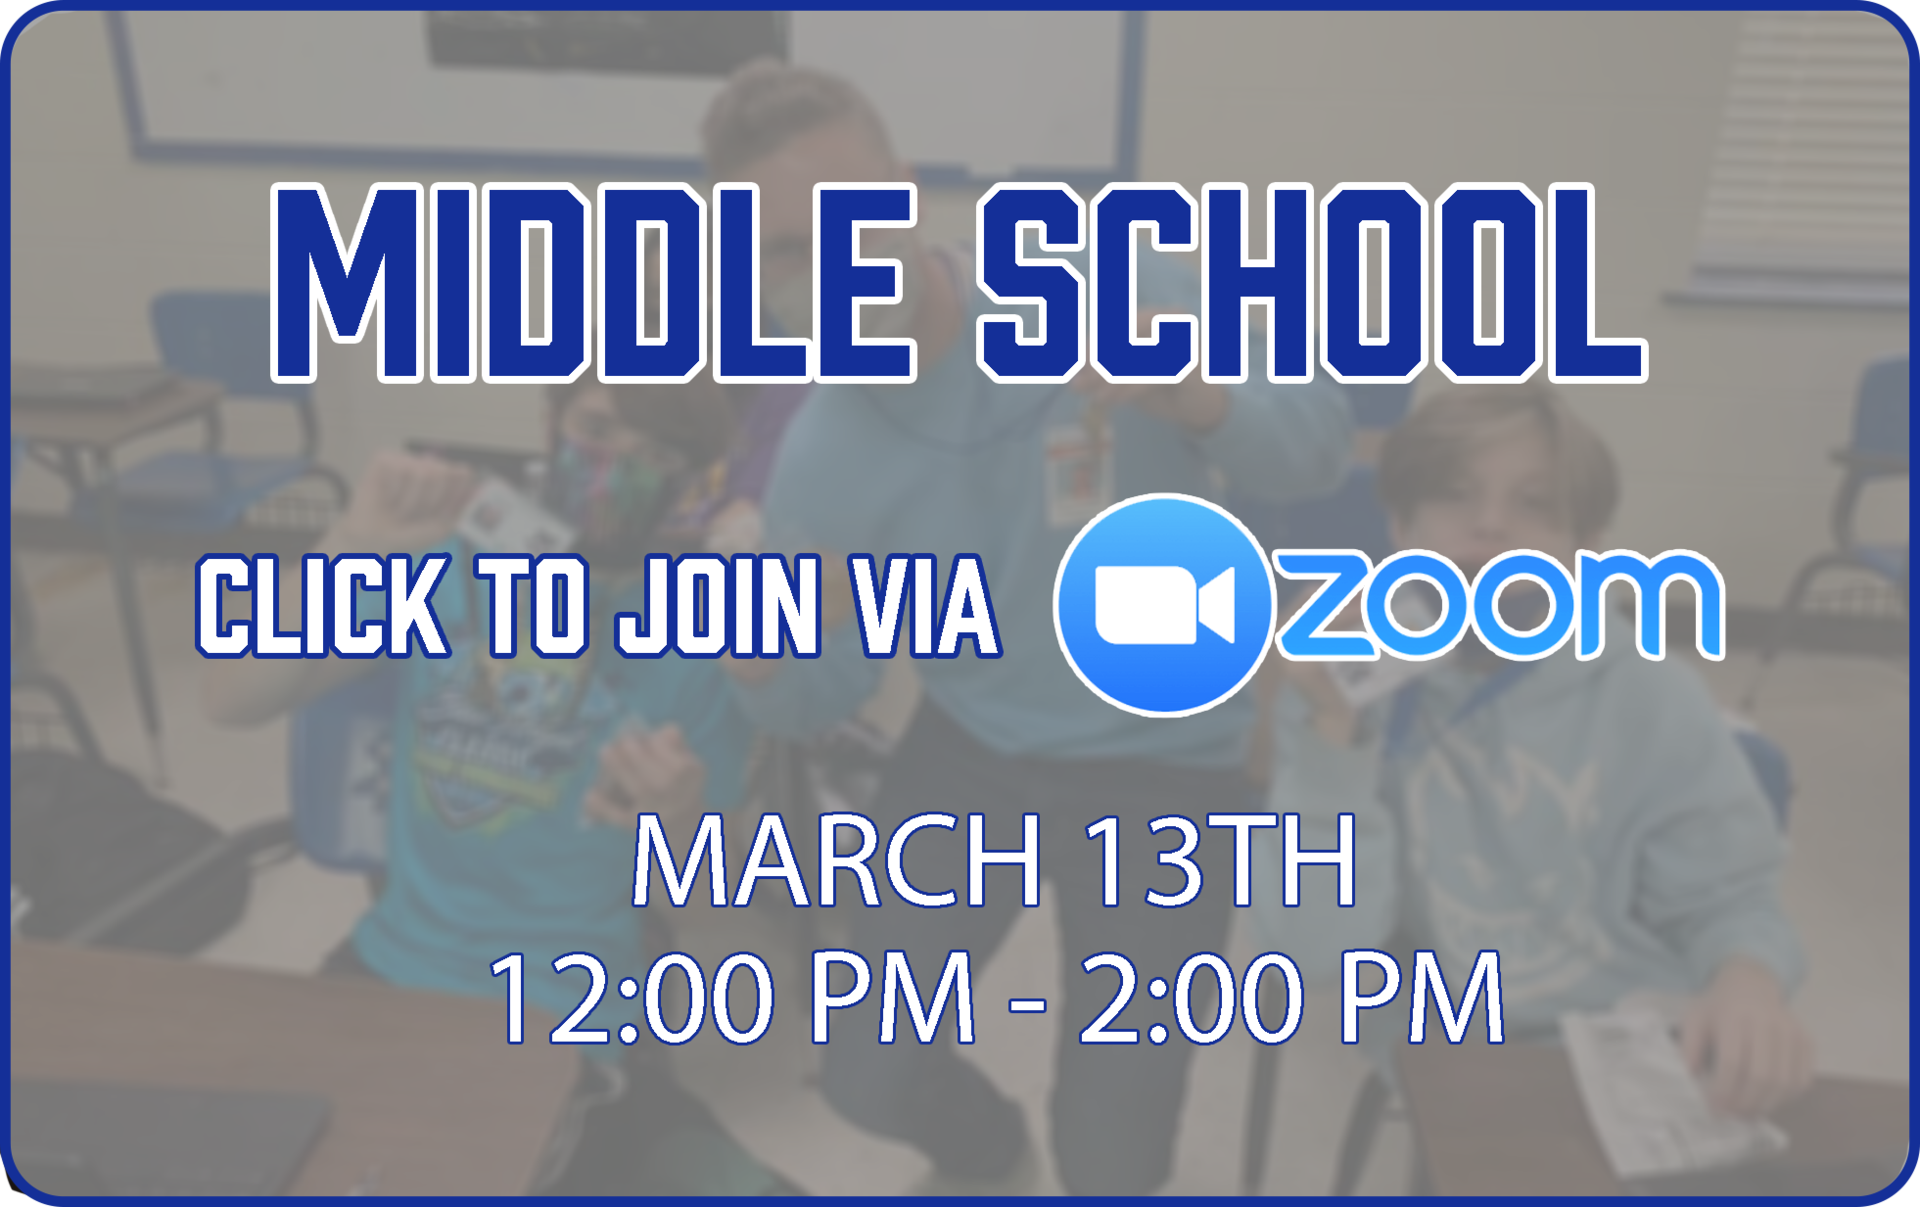 Middle School Zoom Link